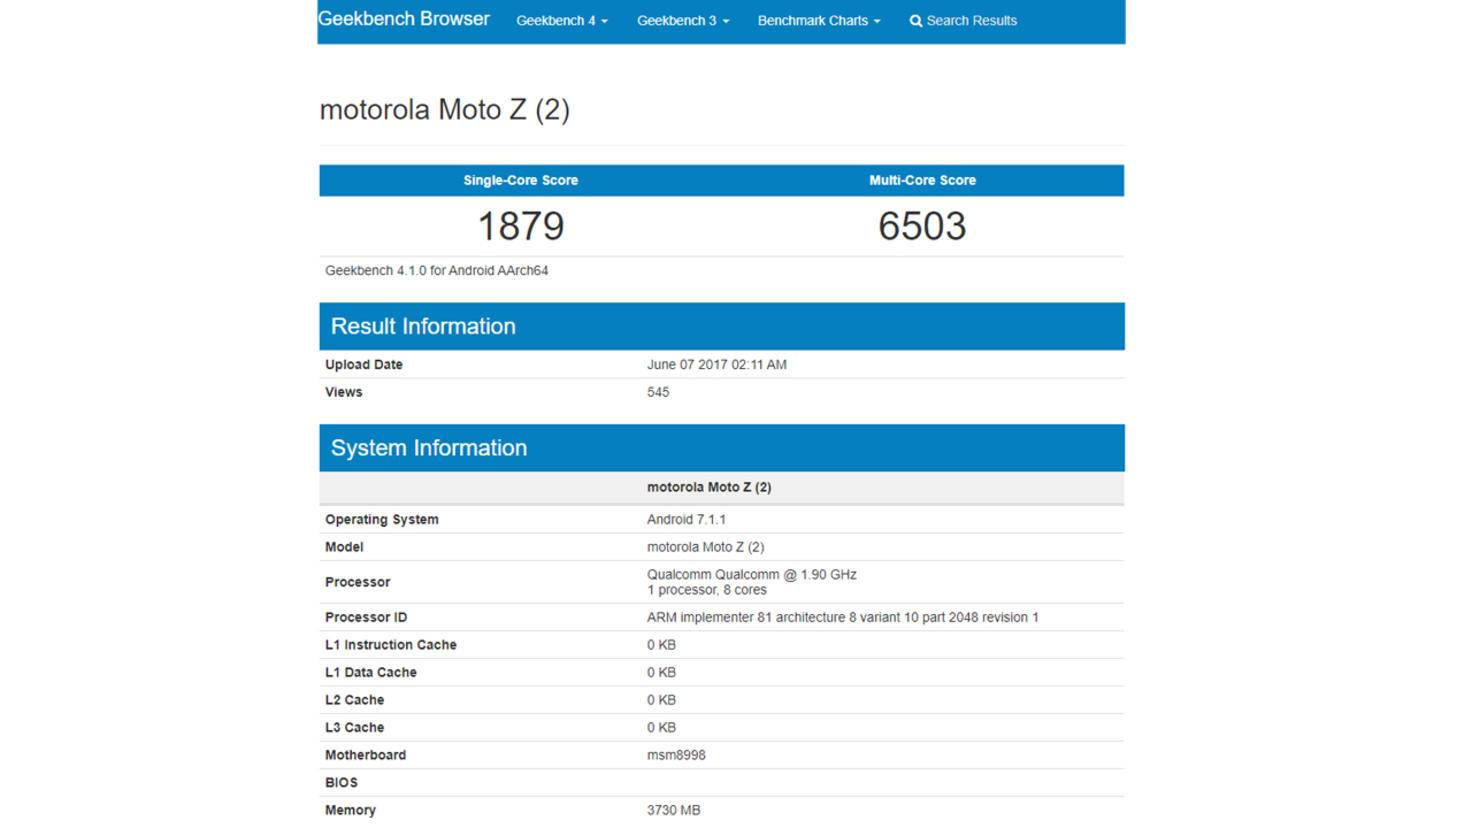 Moto Z2 Geekbench